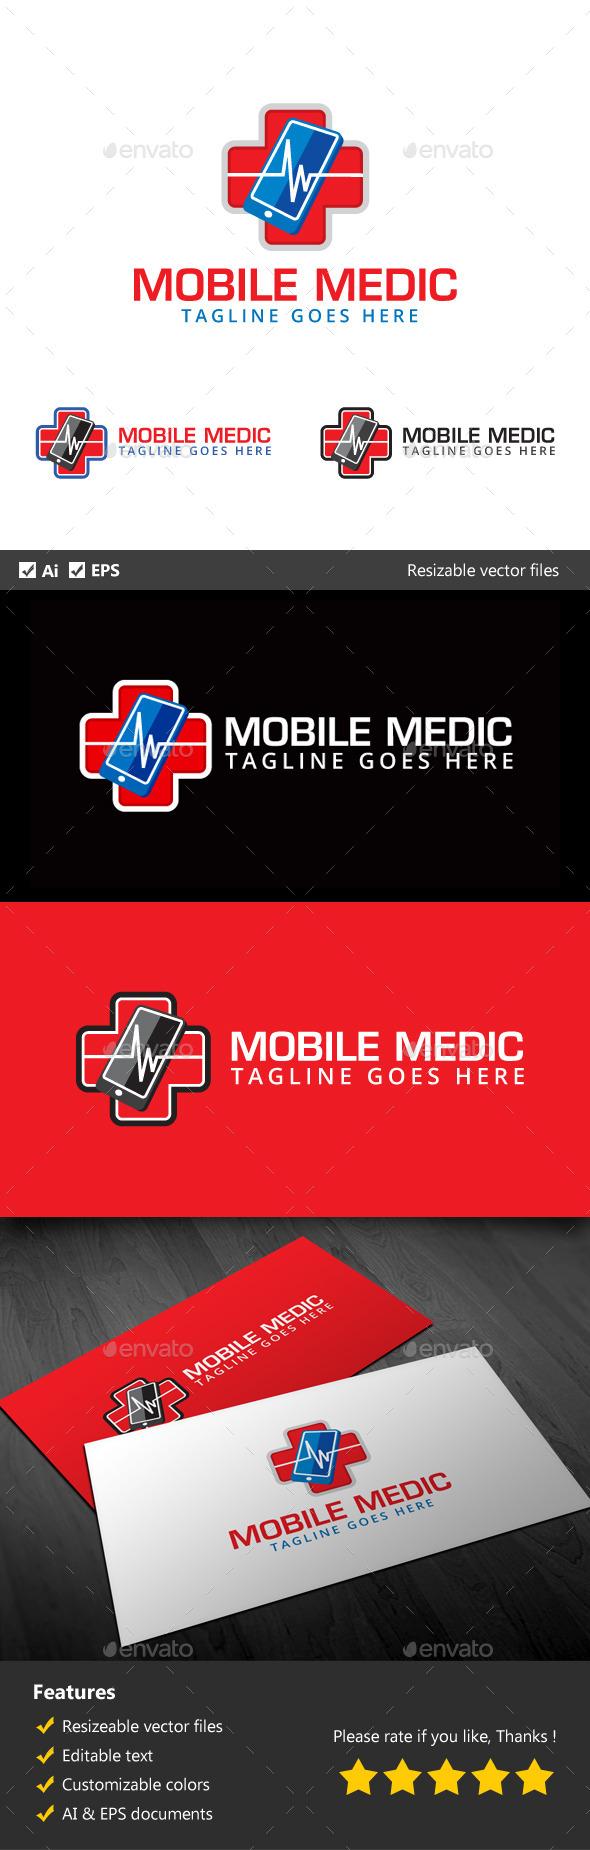 Mobile Medic